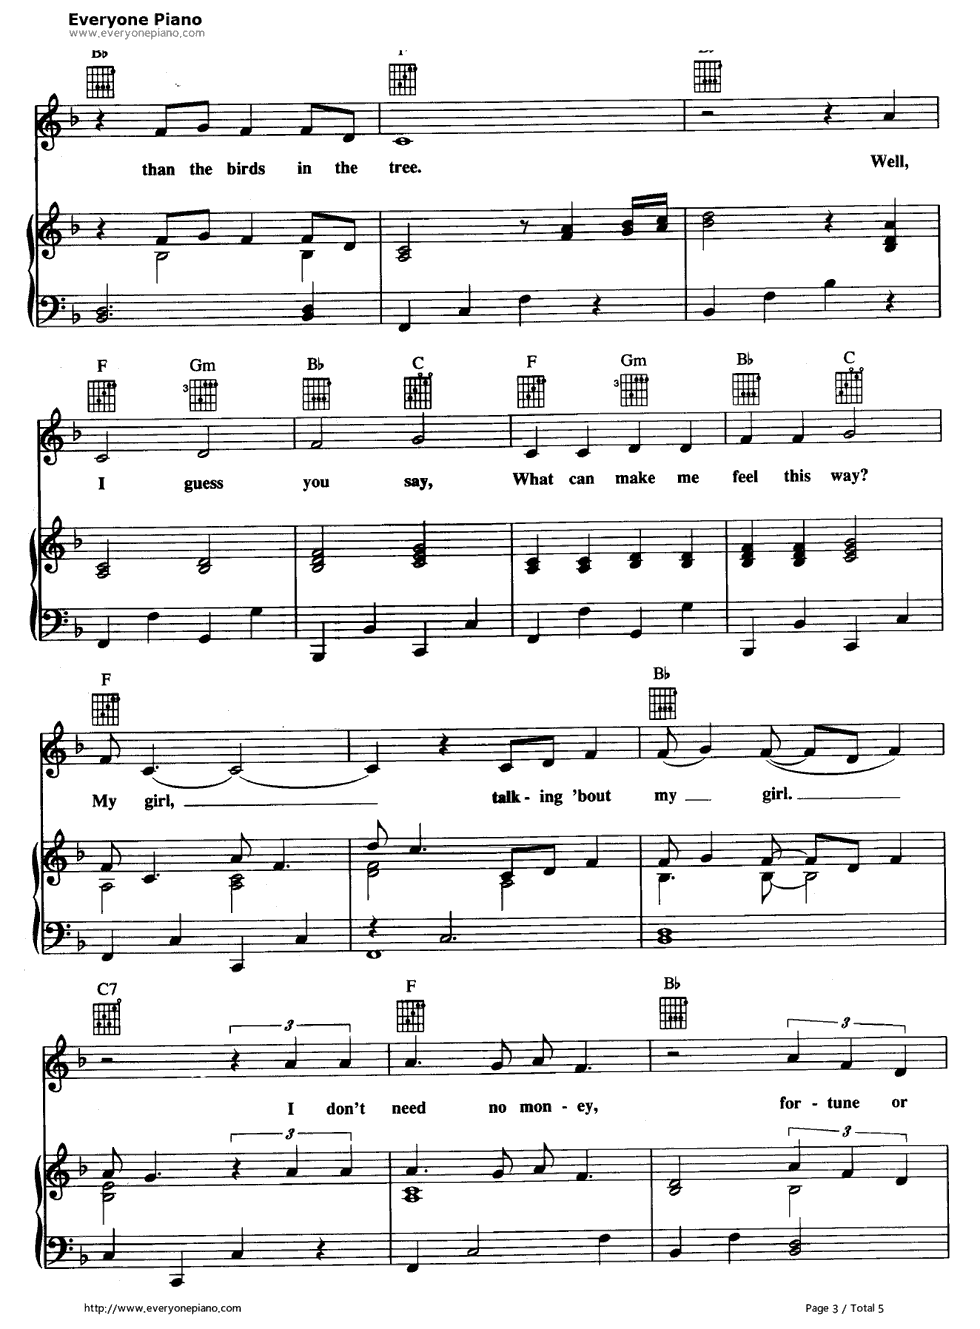 My Girl The Temptations五线谱预览3 钢琴谱档 五线谱 双手简谱 数位谱